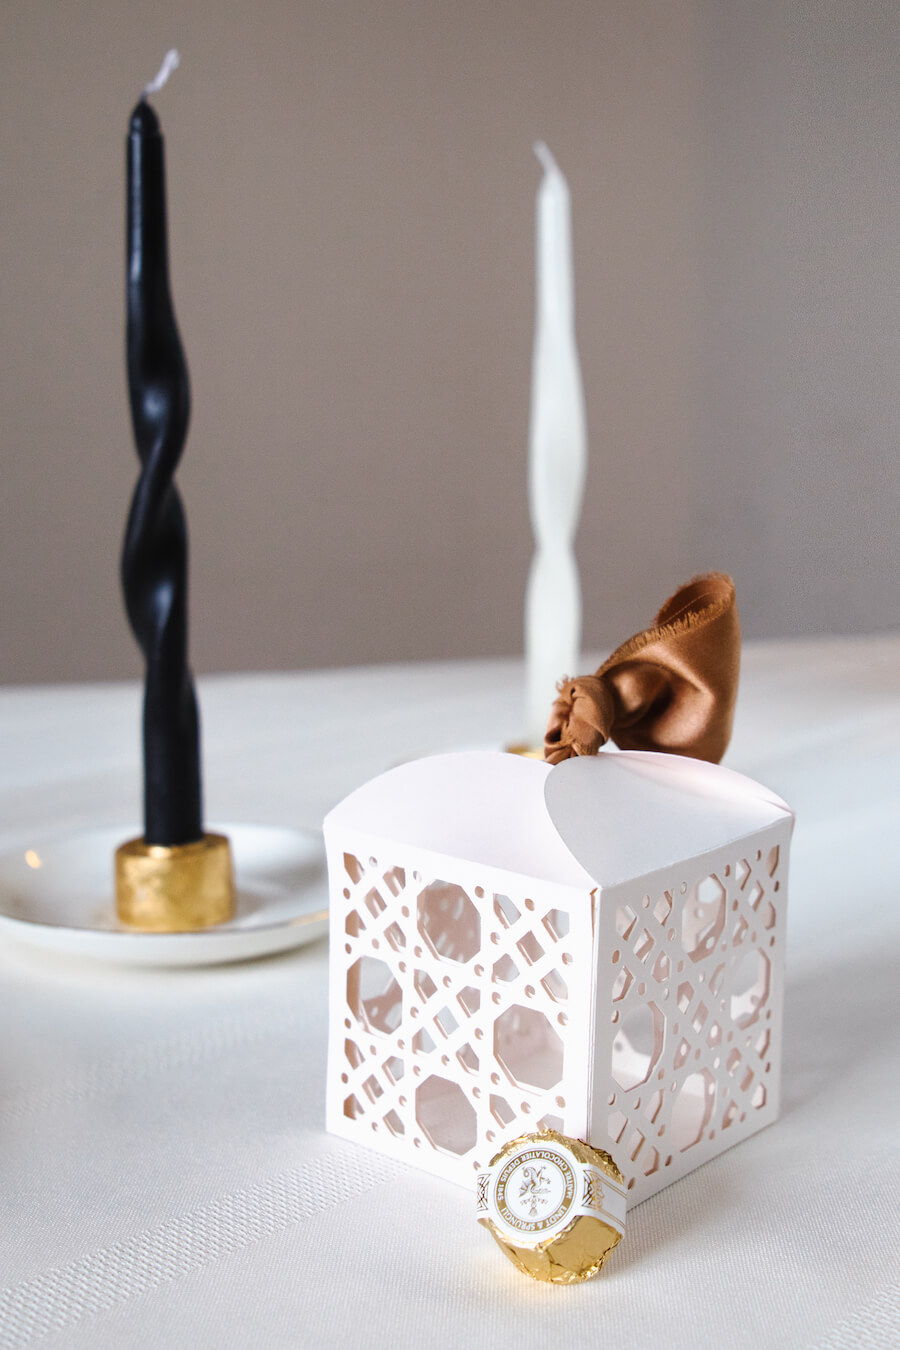 Woven Cane Gift Box